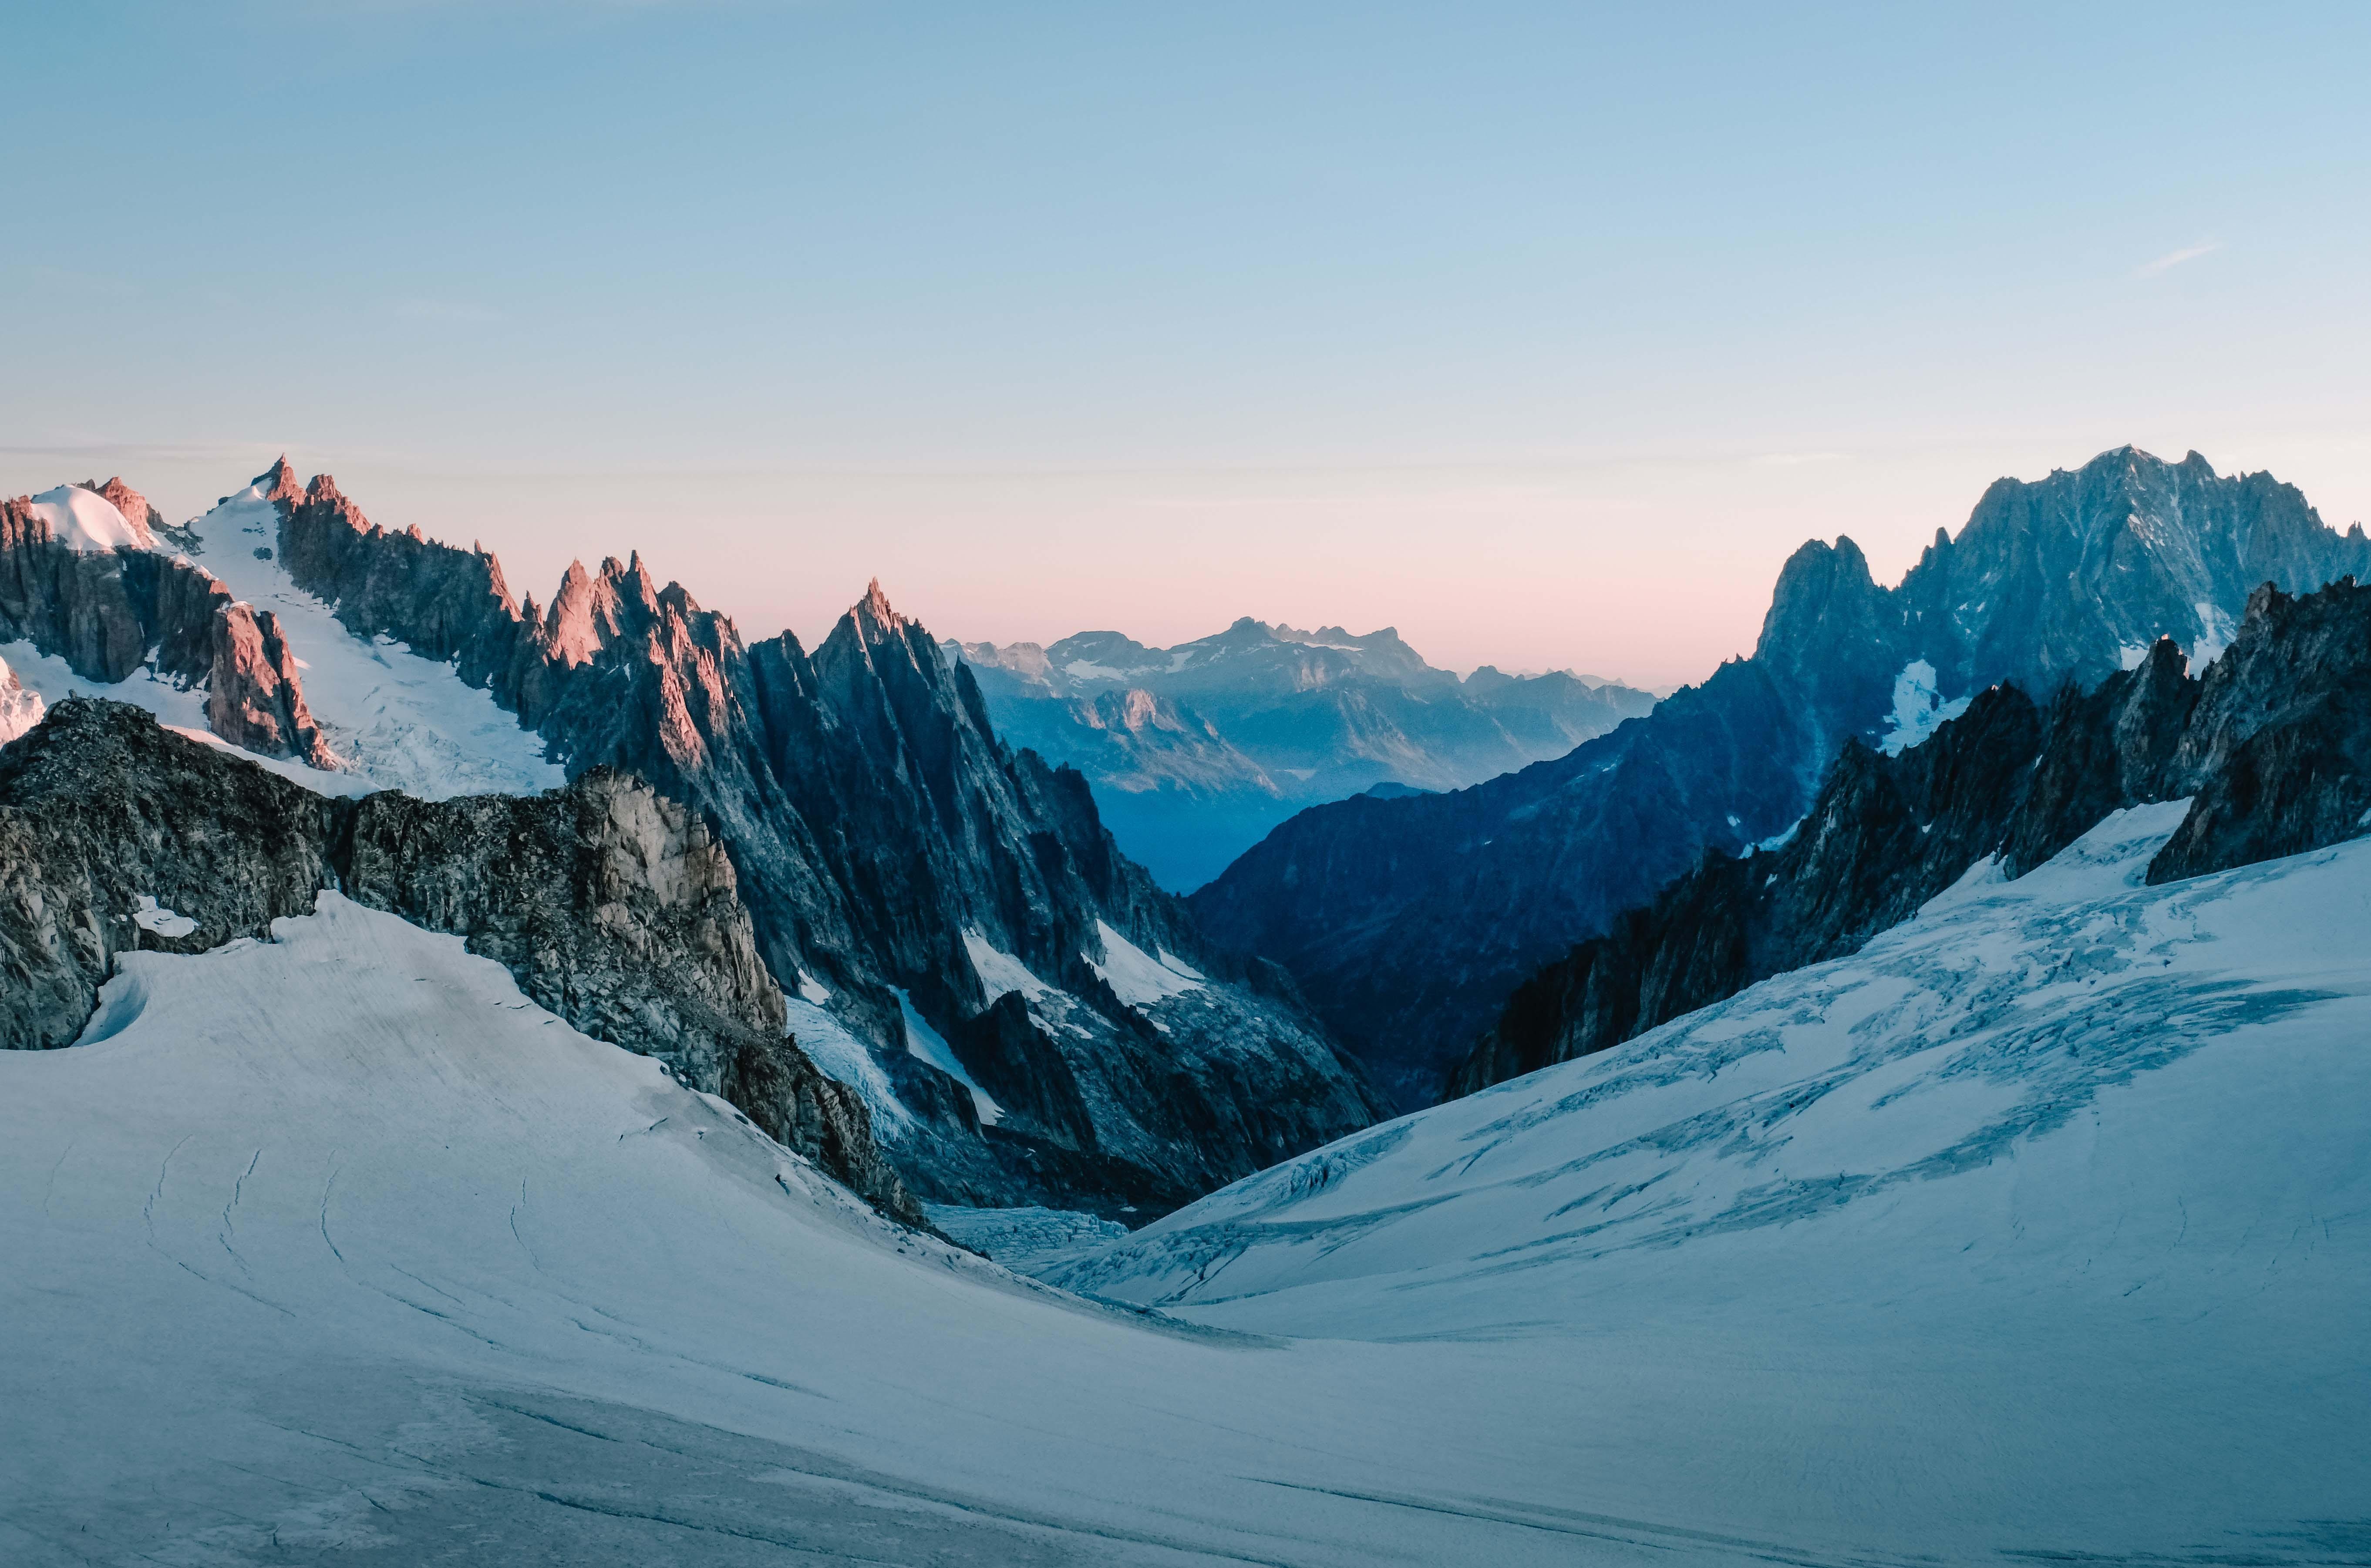 mountains covered in snow 1574937681 - Mountains Covered In Snow -